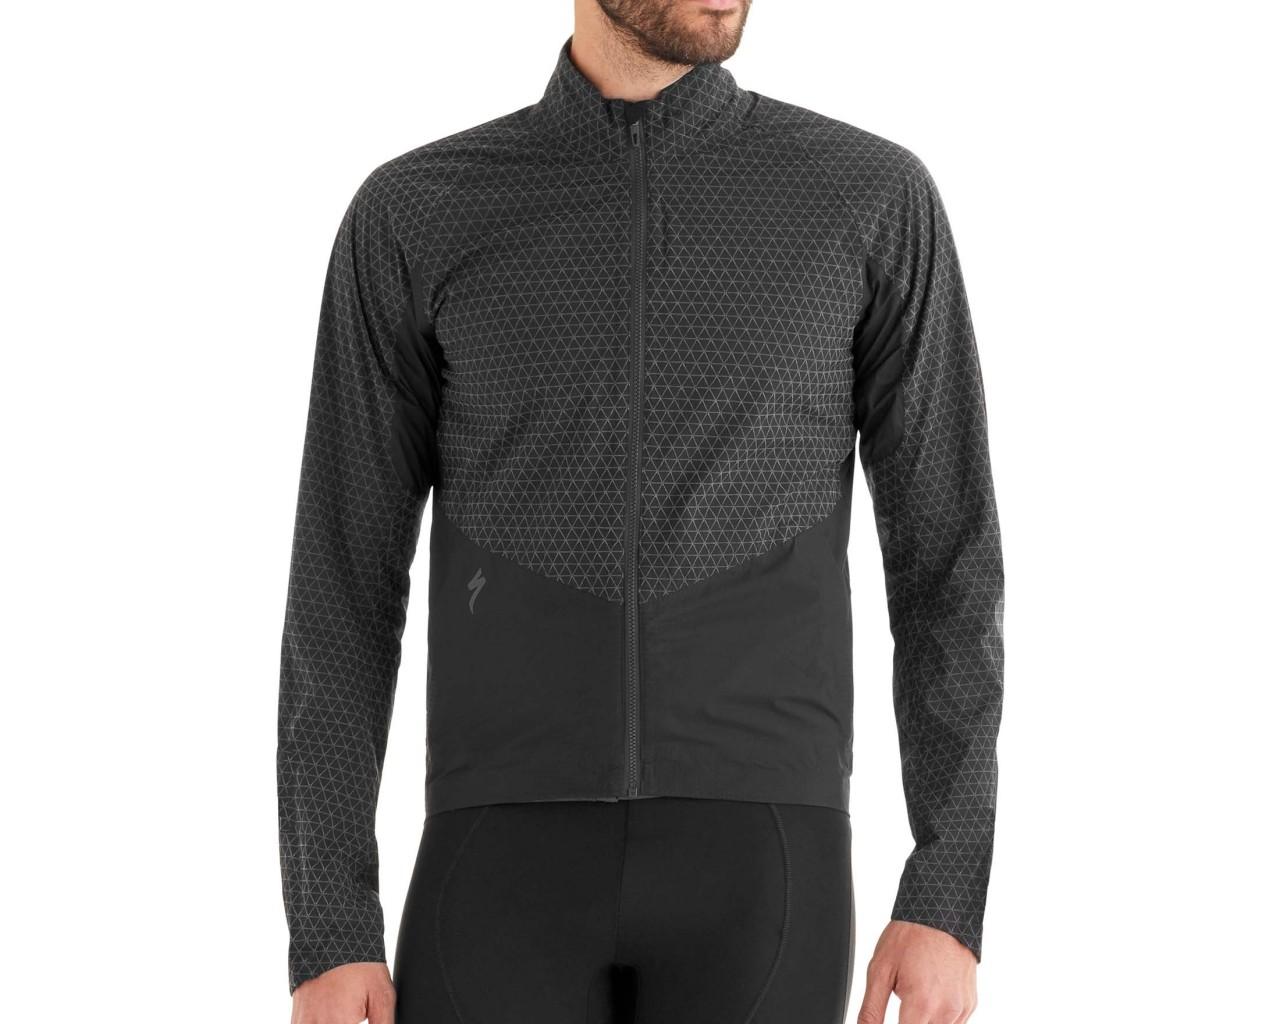 Specialized Deflect Reflect H2O Jacket | black reflective